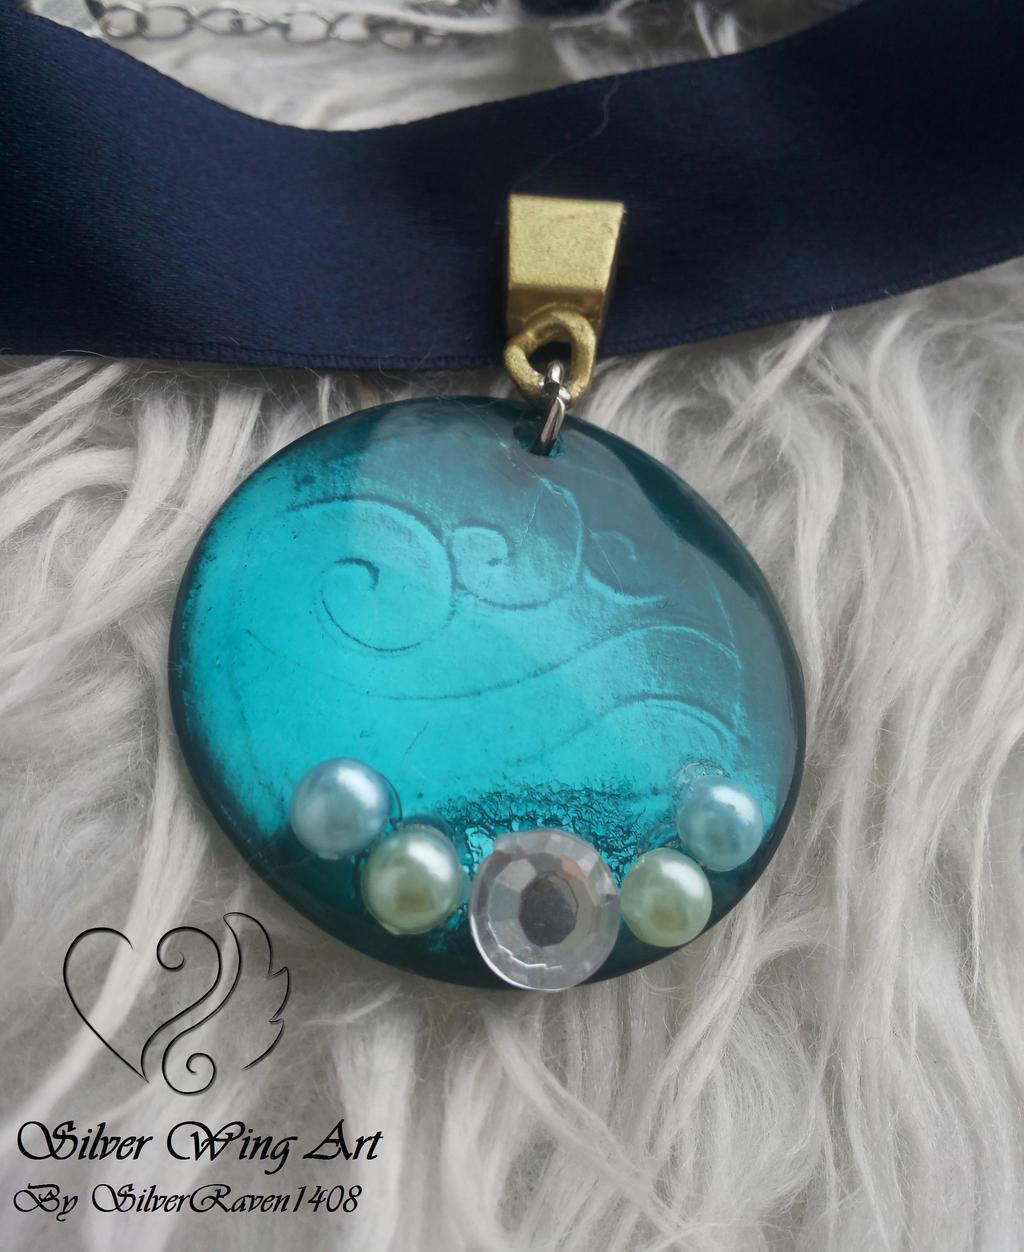 katara s necklace by silverraven1408 on deviantart